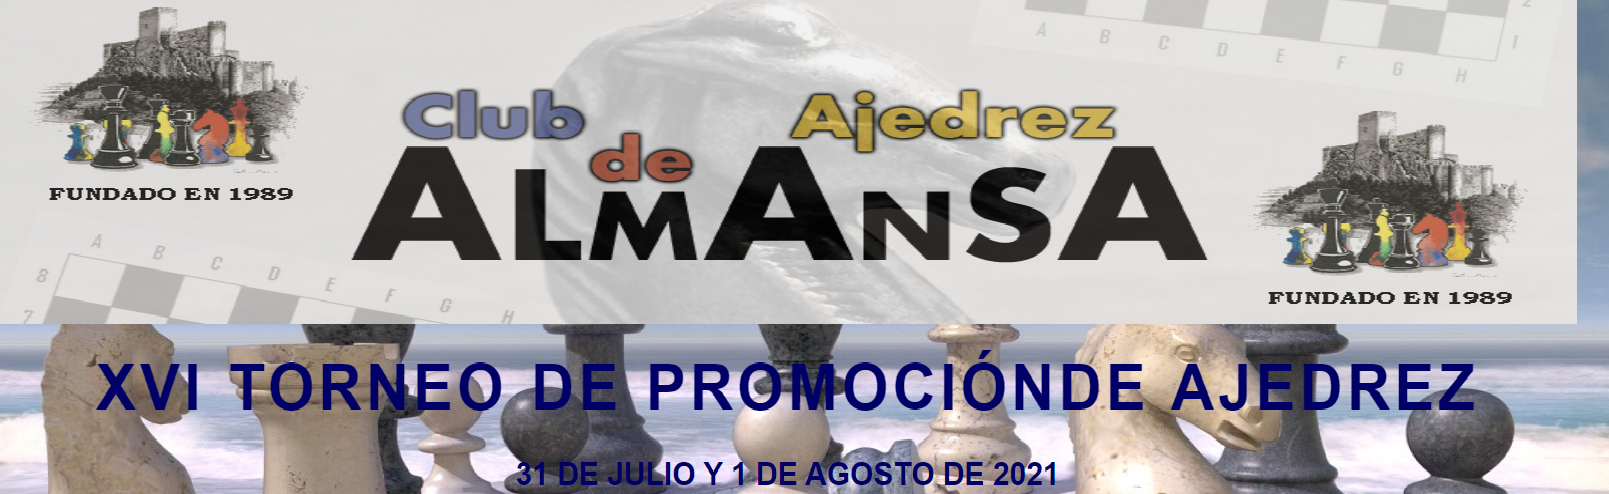 Feria de Almansa